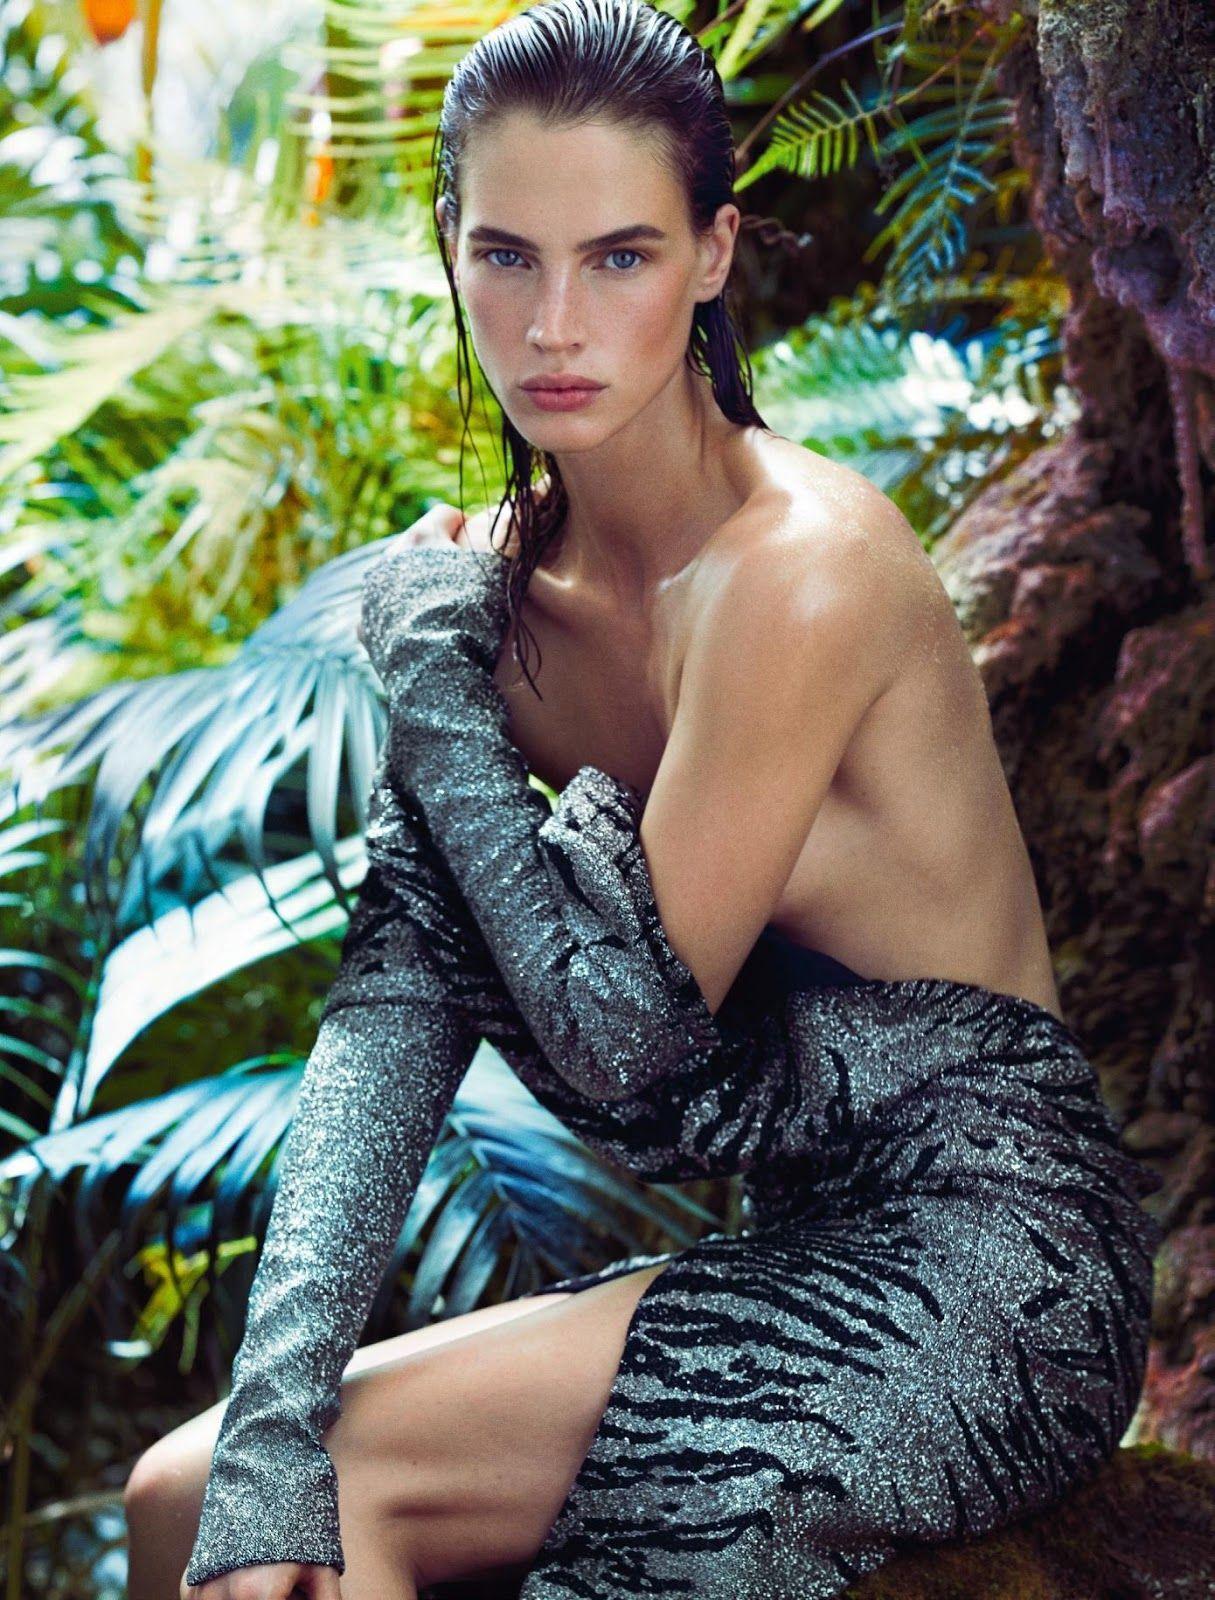 Crista cober numero magazine aug 2015 by txema yeste hq photo shoot